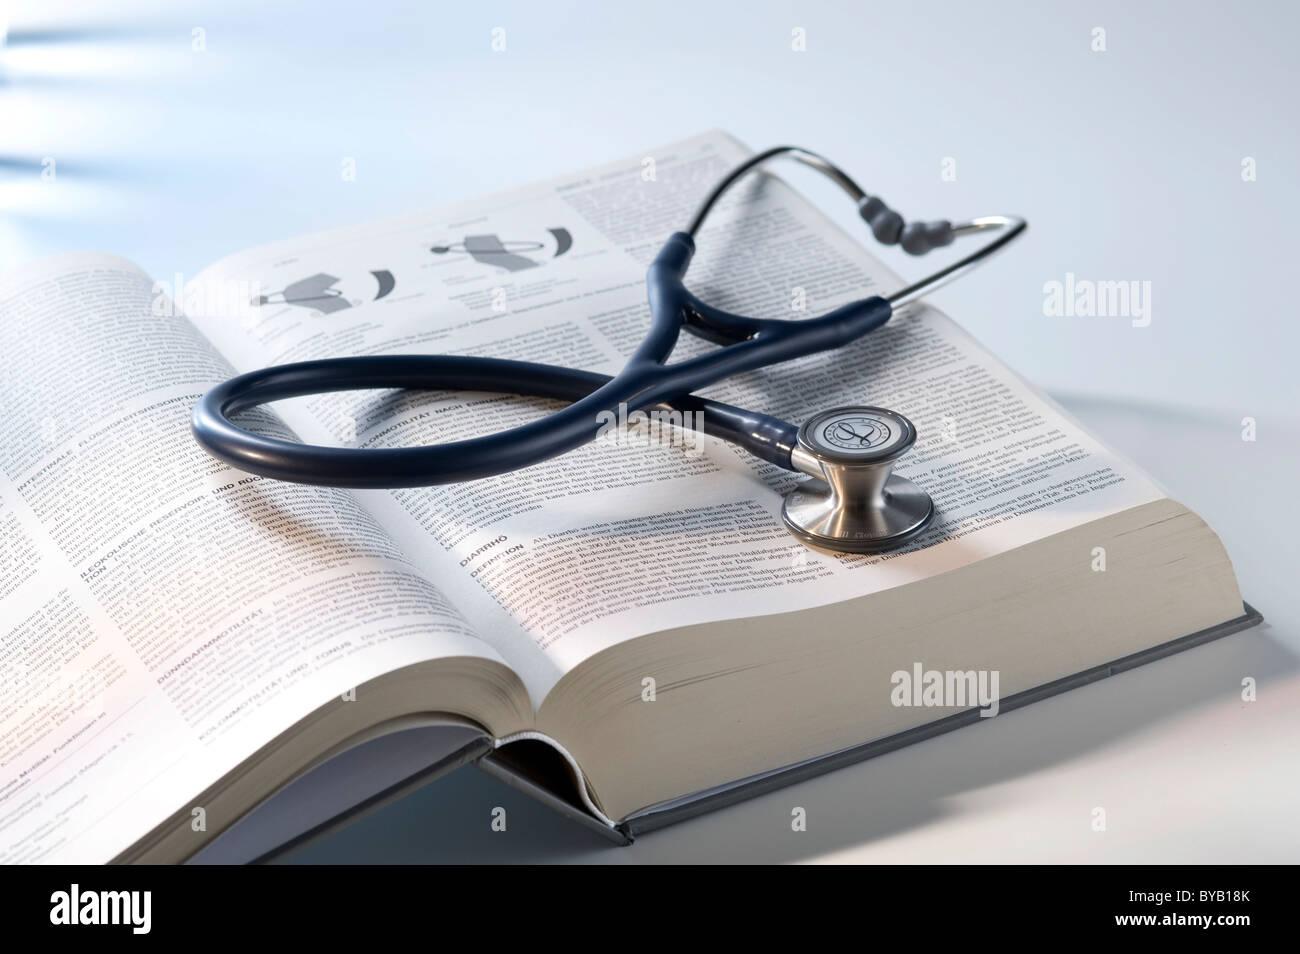 Stethoscope, medicine textbook - Stock Image